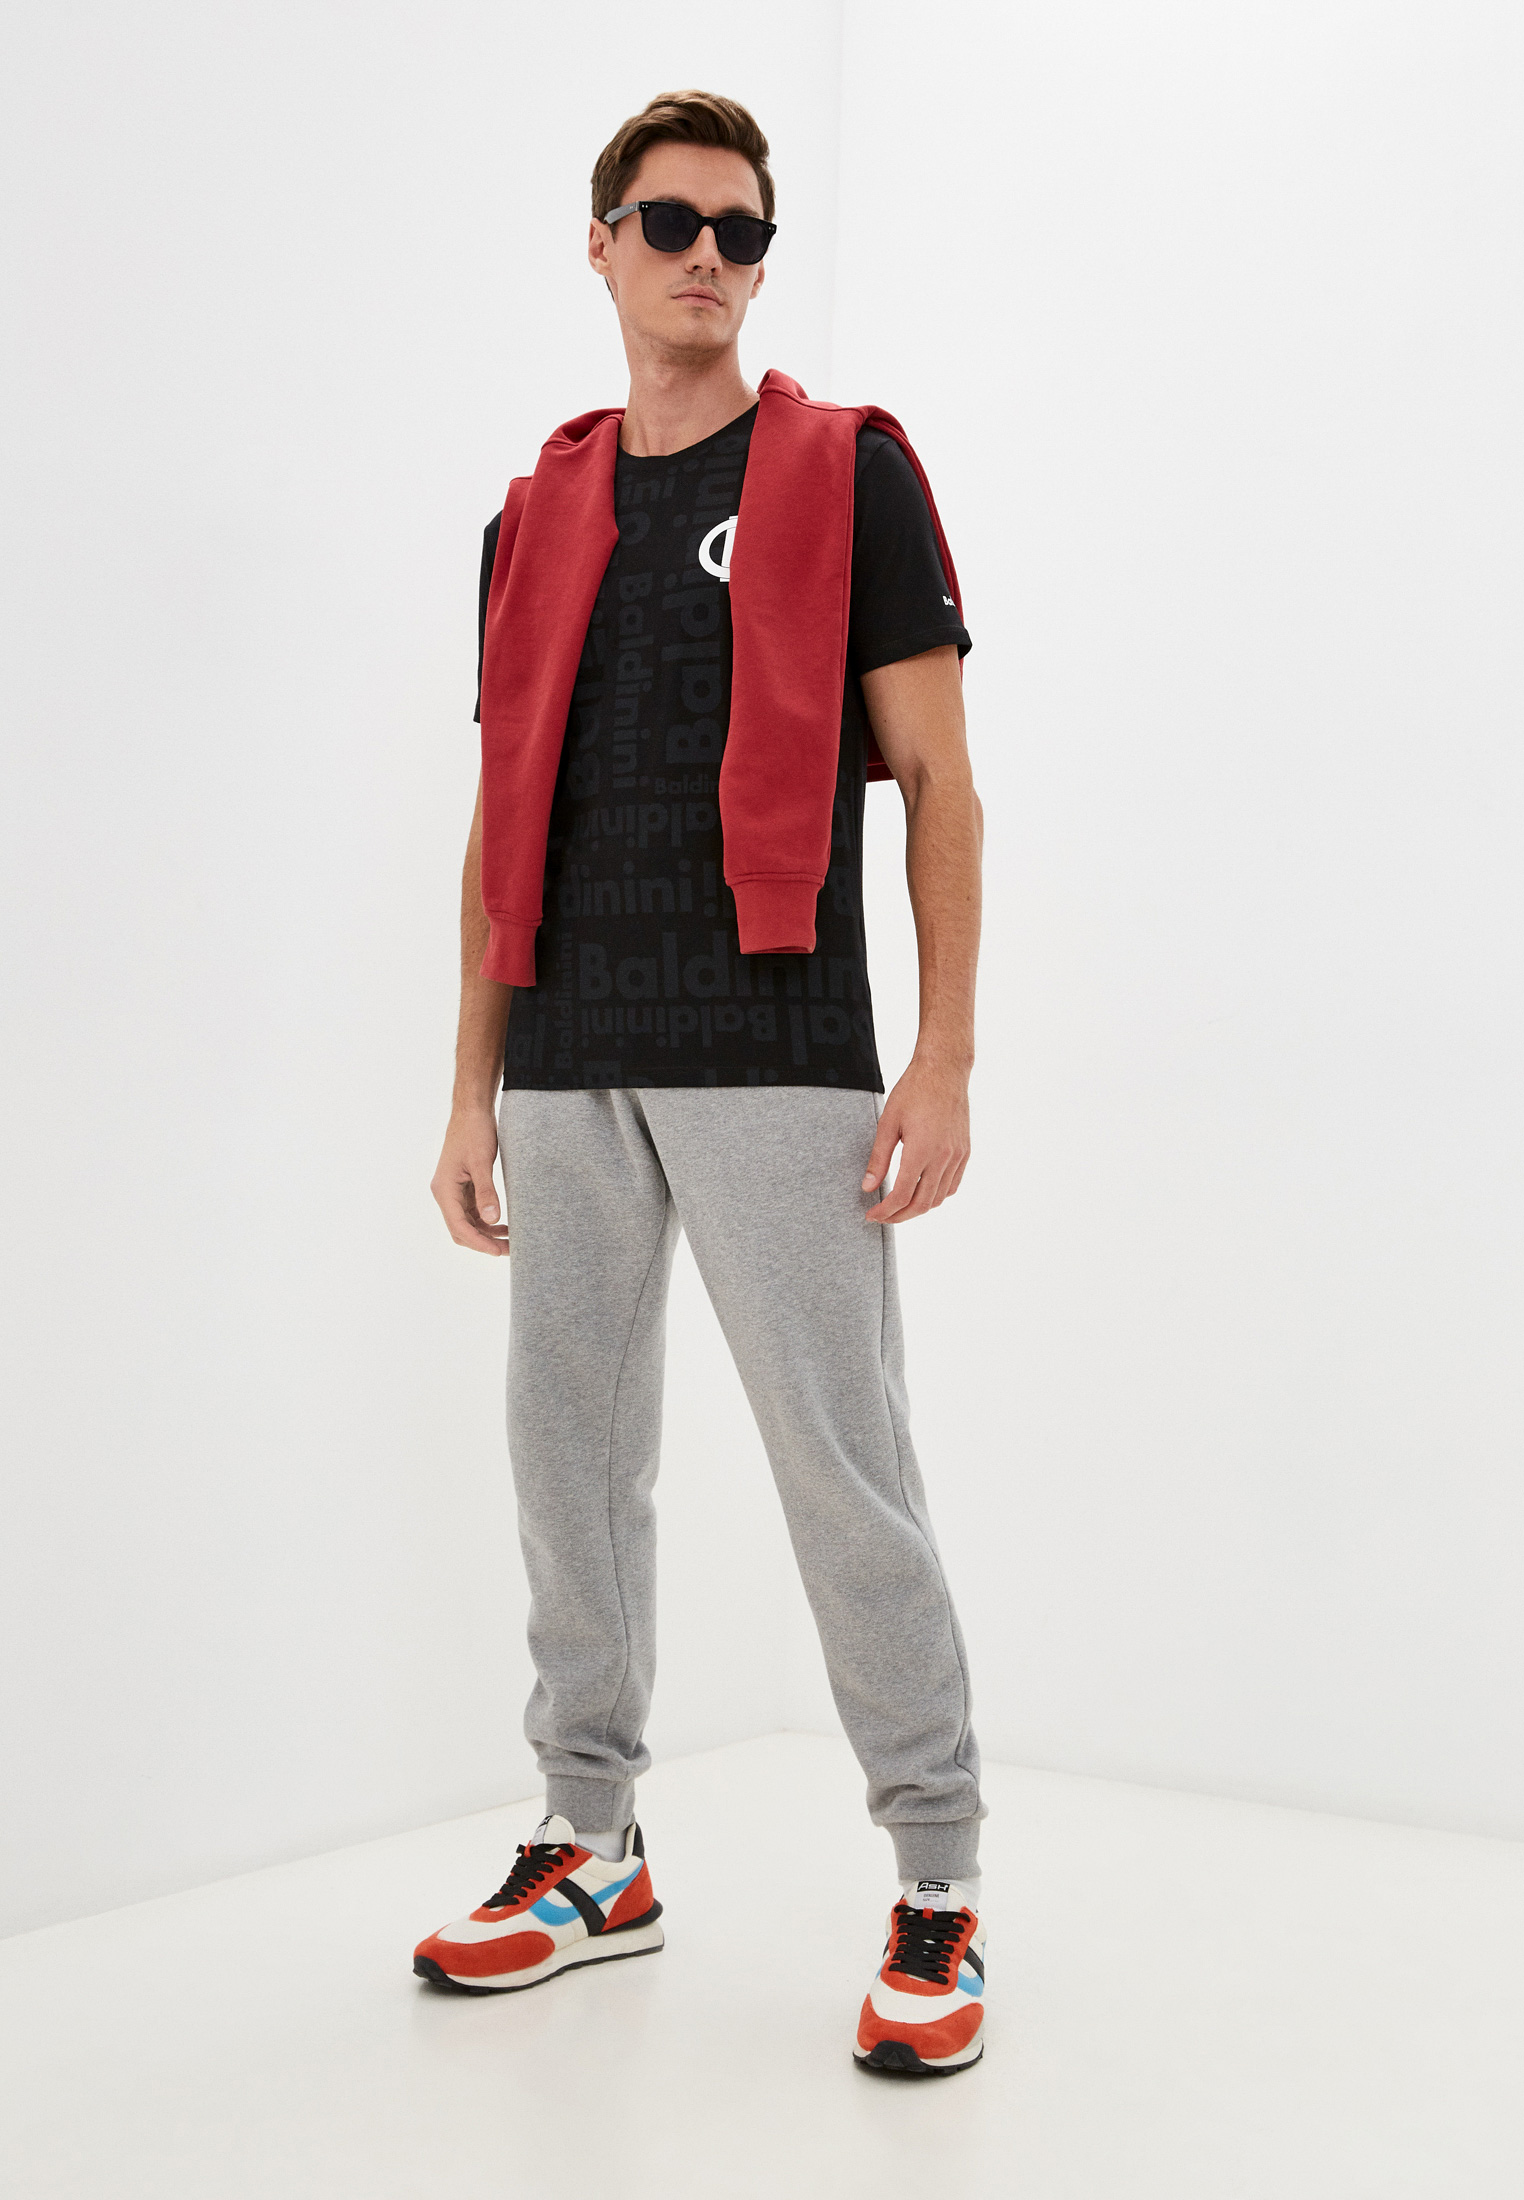 Мужская футболка Baldinini (Балдинини) TSU06: изображение 3